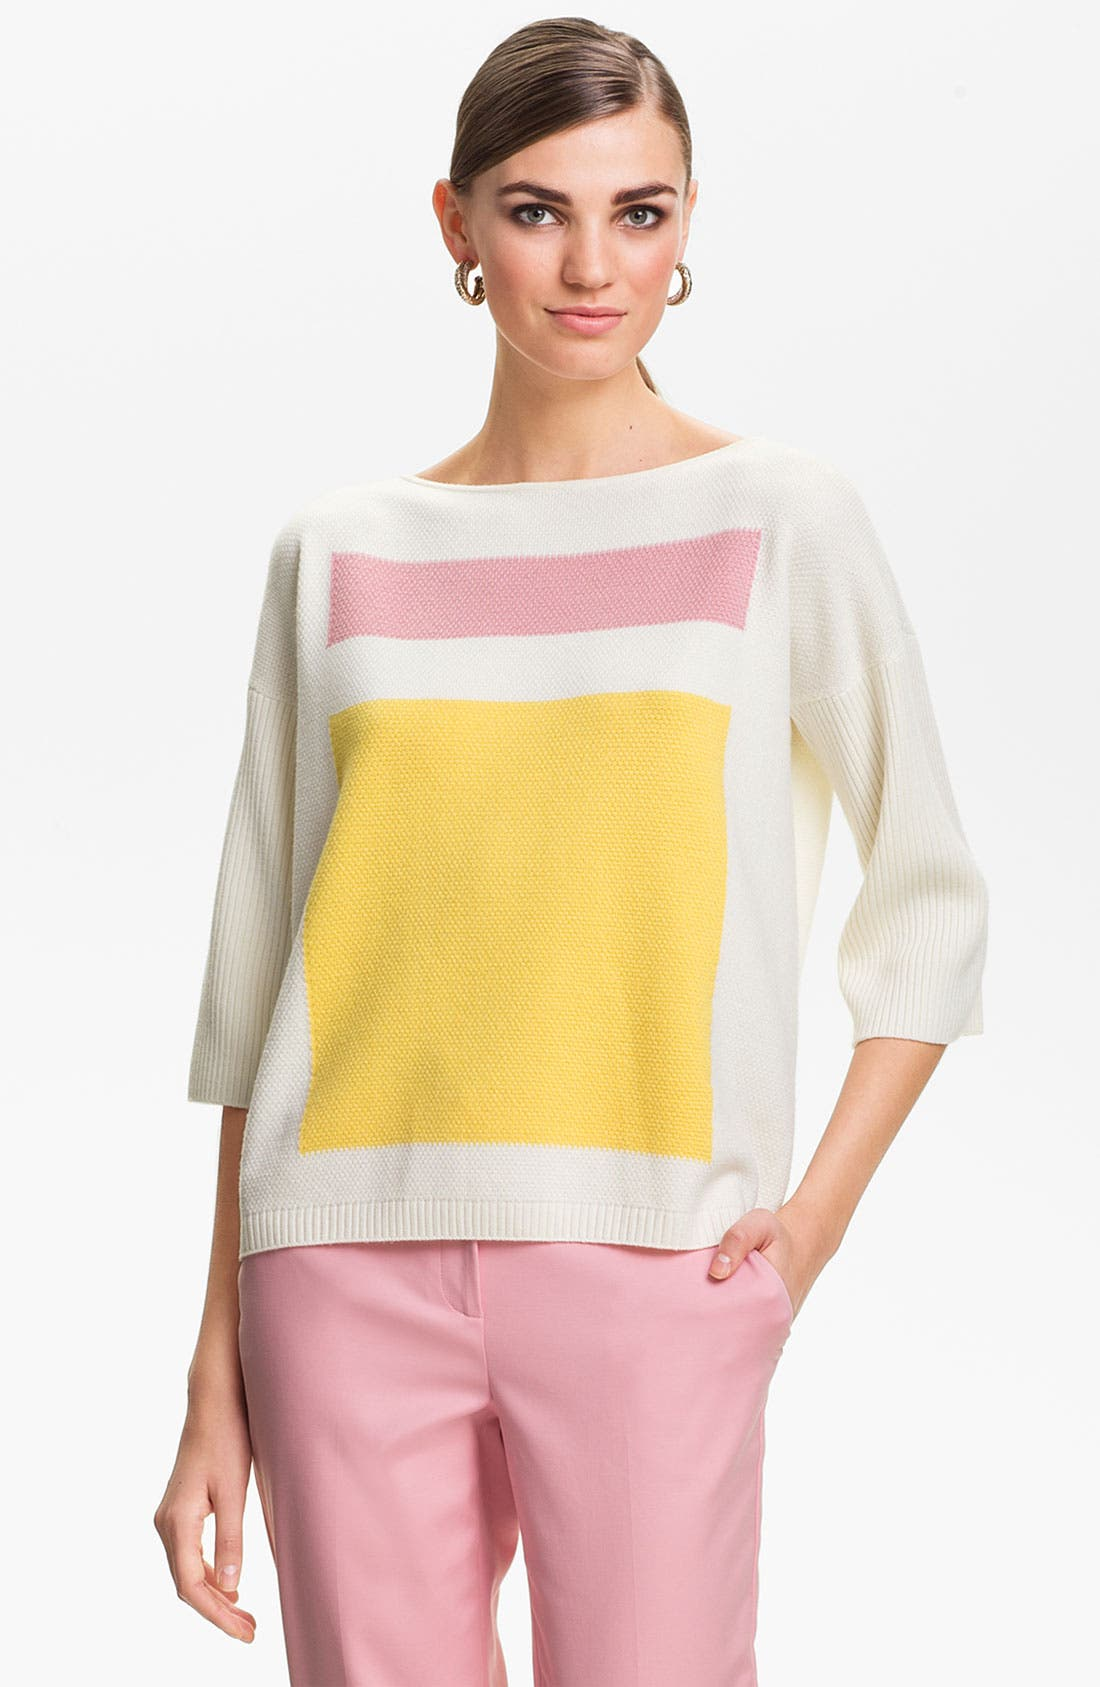 Main Image - St. John Yellow Label Colorblock Popcorn Knit Sweater